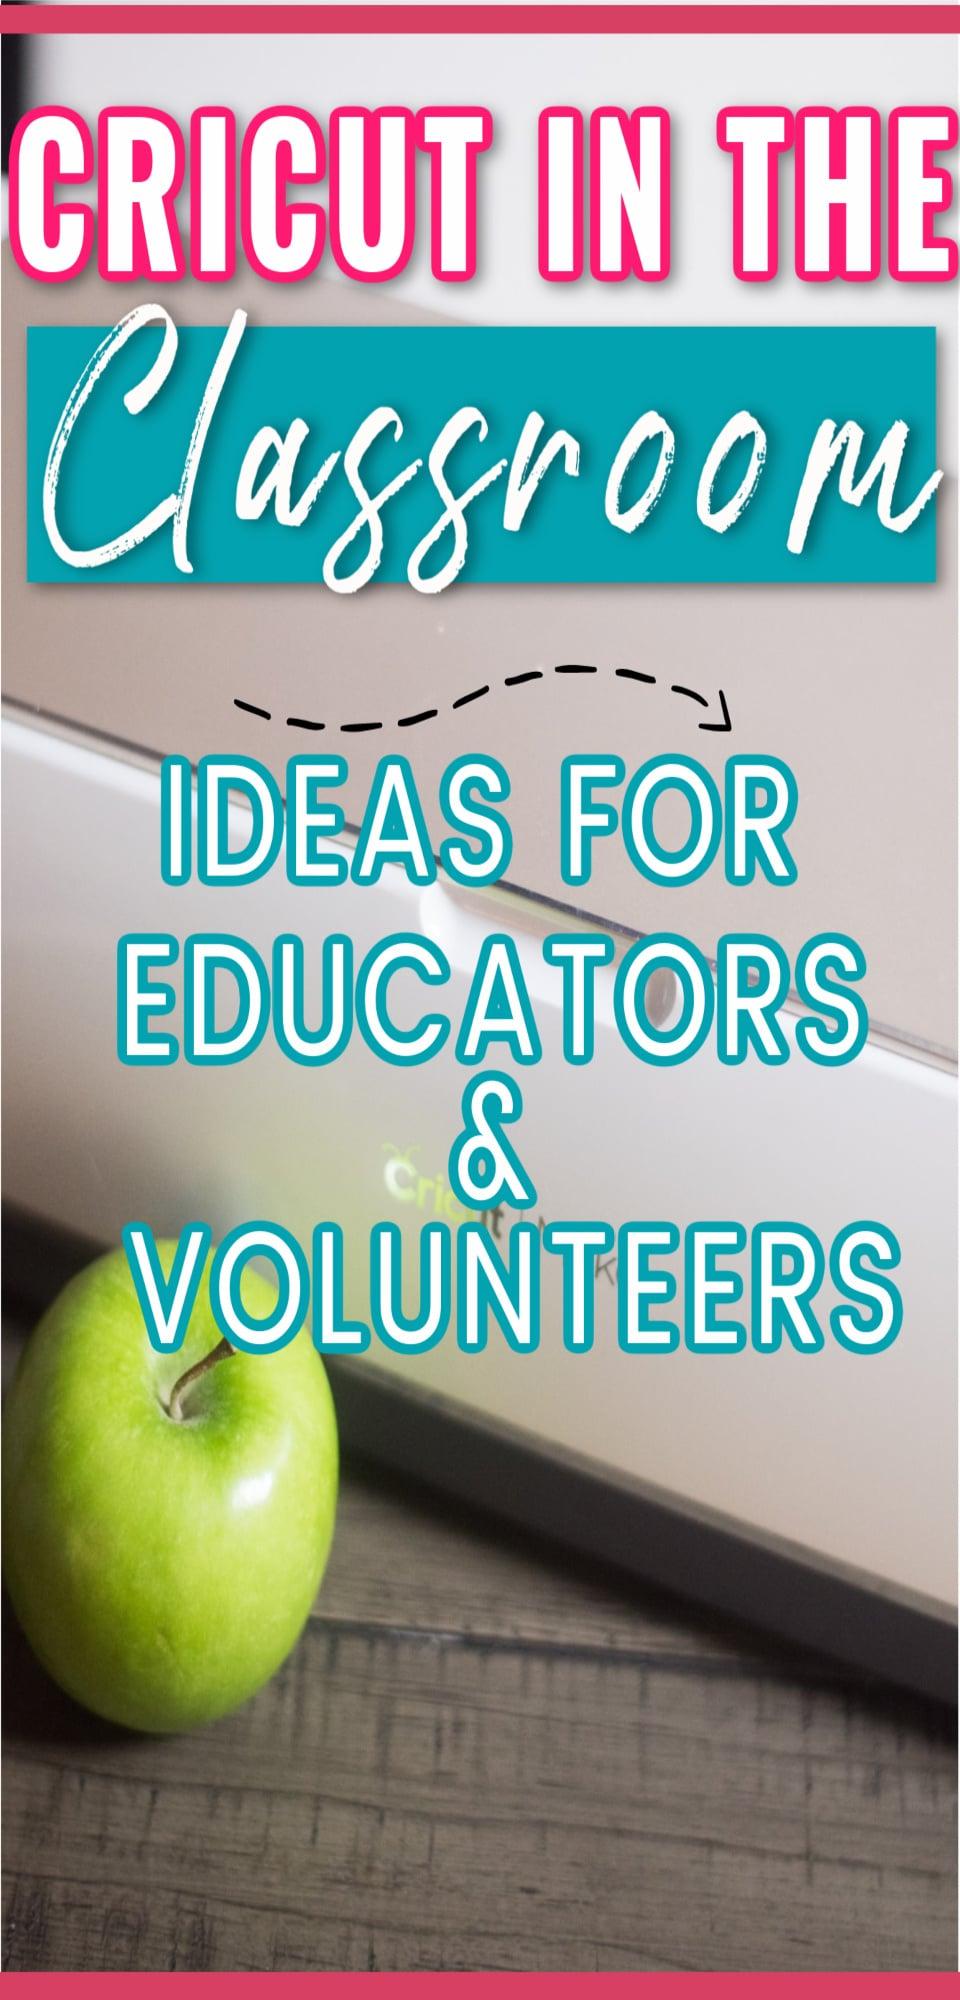 Cricut in the Classroom: Tons of ideas for teachers, volunteers, and more. #cricut #cricutmaker #cricutmade #cricutcreated #school #teacher via @clarkscondensed